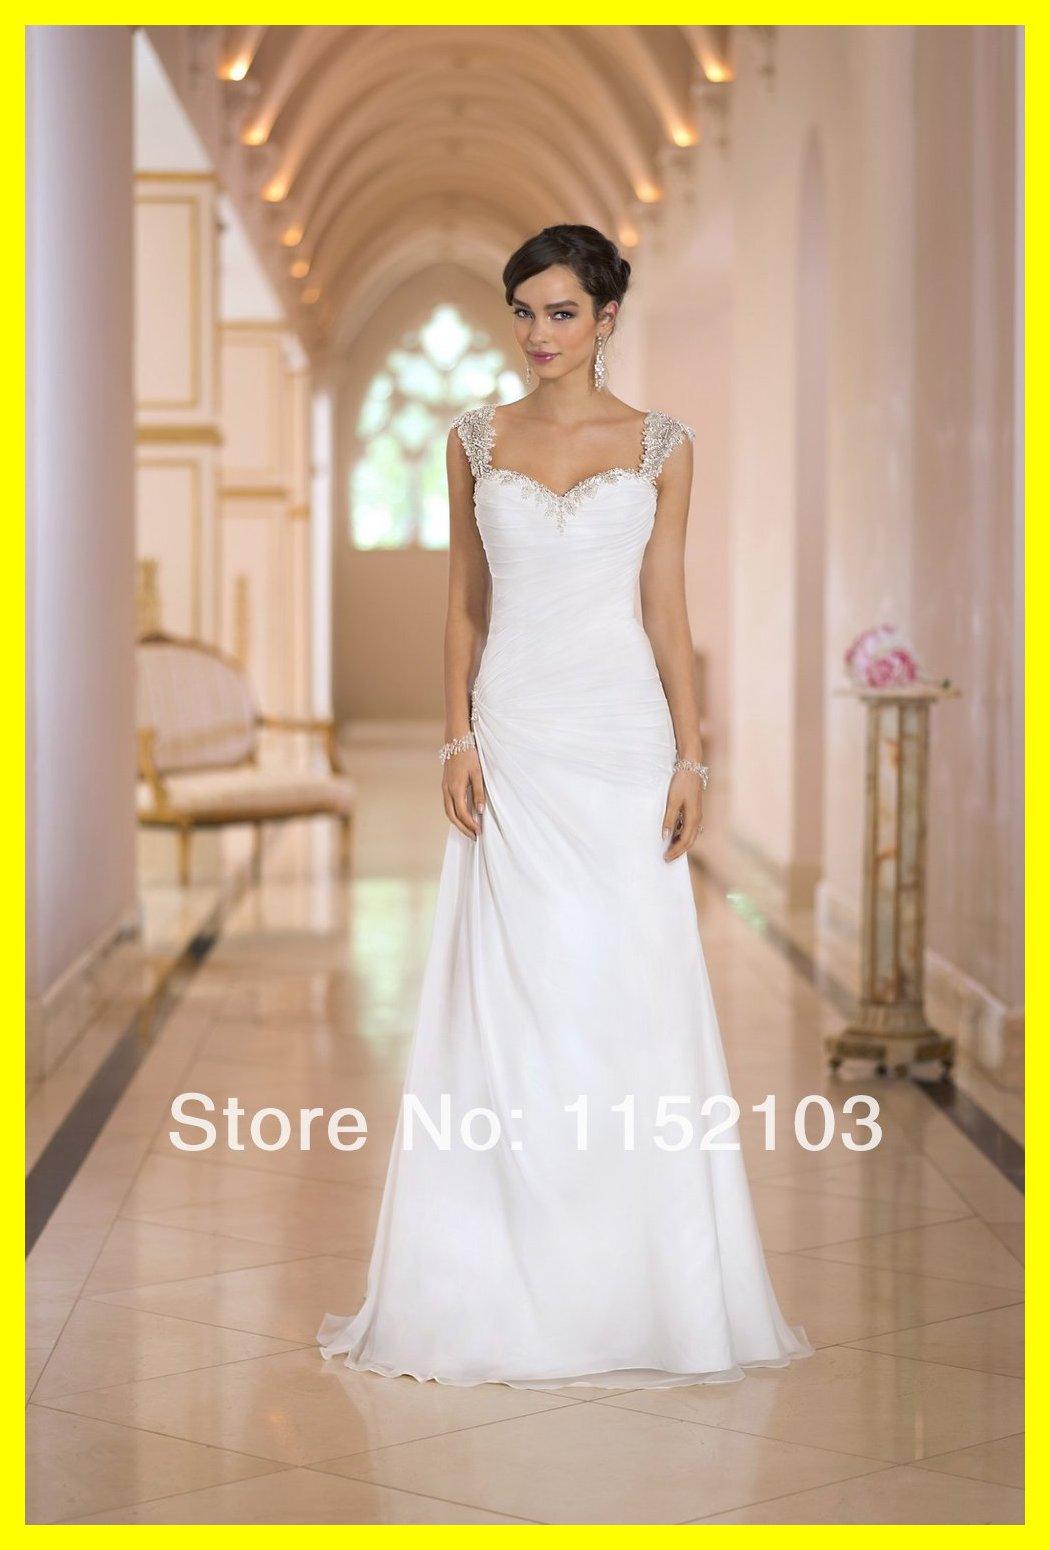 Cotton Wedding Dress Dresses Guests Party High Street Plus